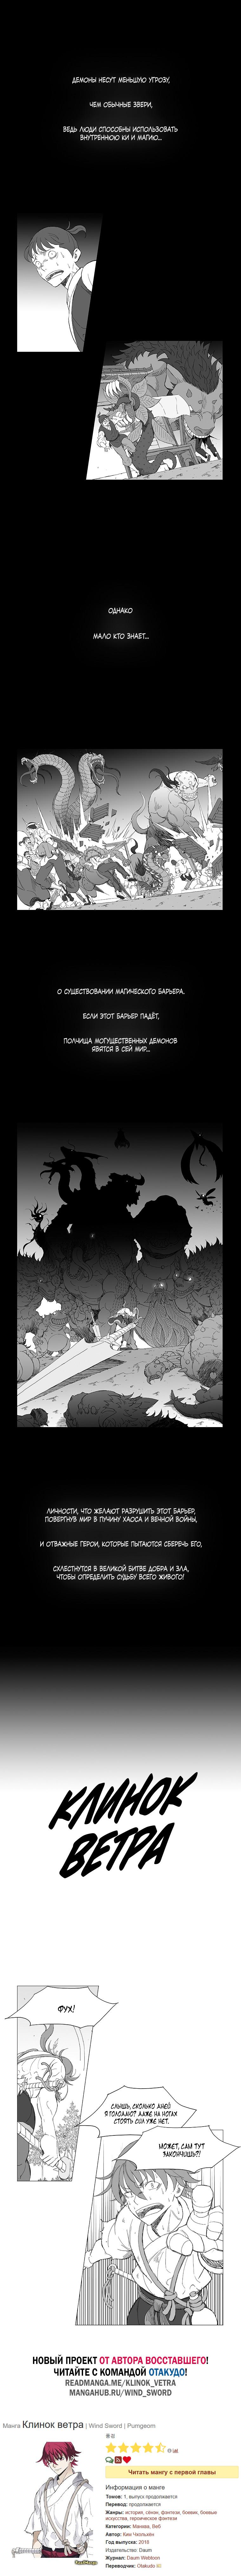 https://r1.ninemanga.com/comics/pic3/39/28263/1275882/1542235223946.jpg Page 8